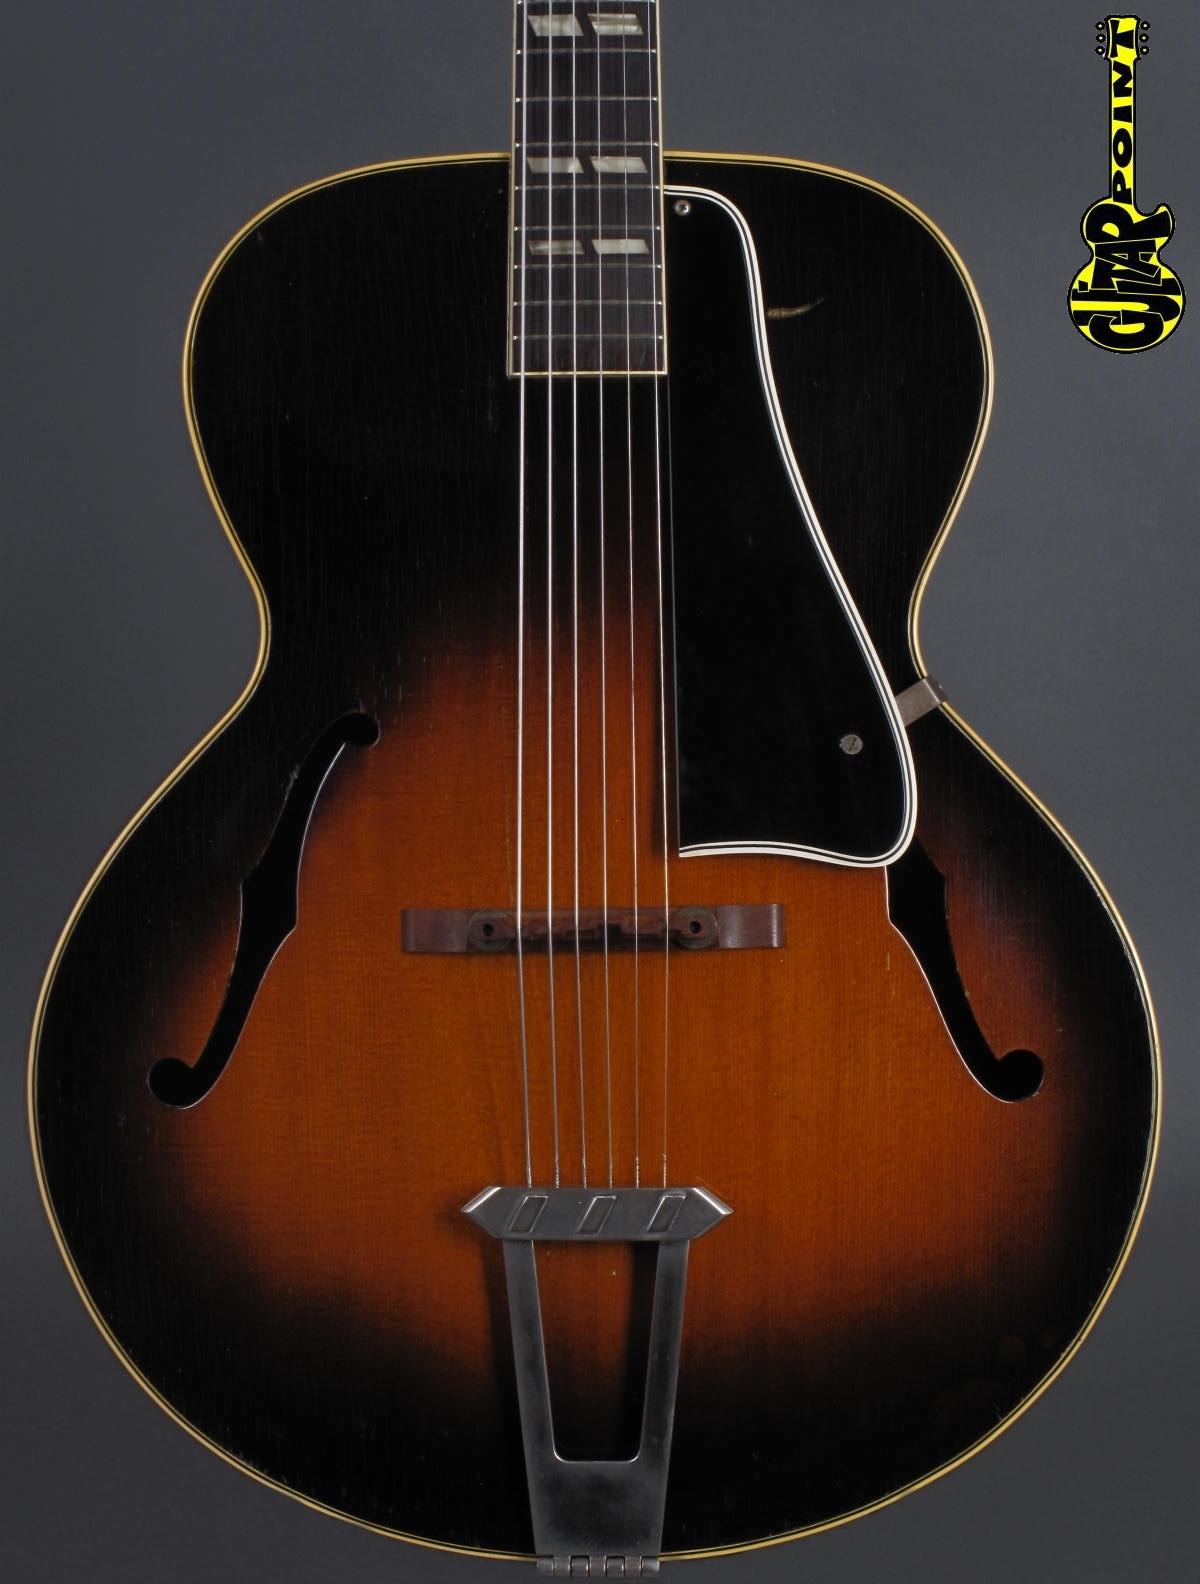 1951 Gibson L-4 - Sunburst